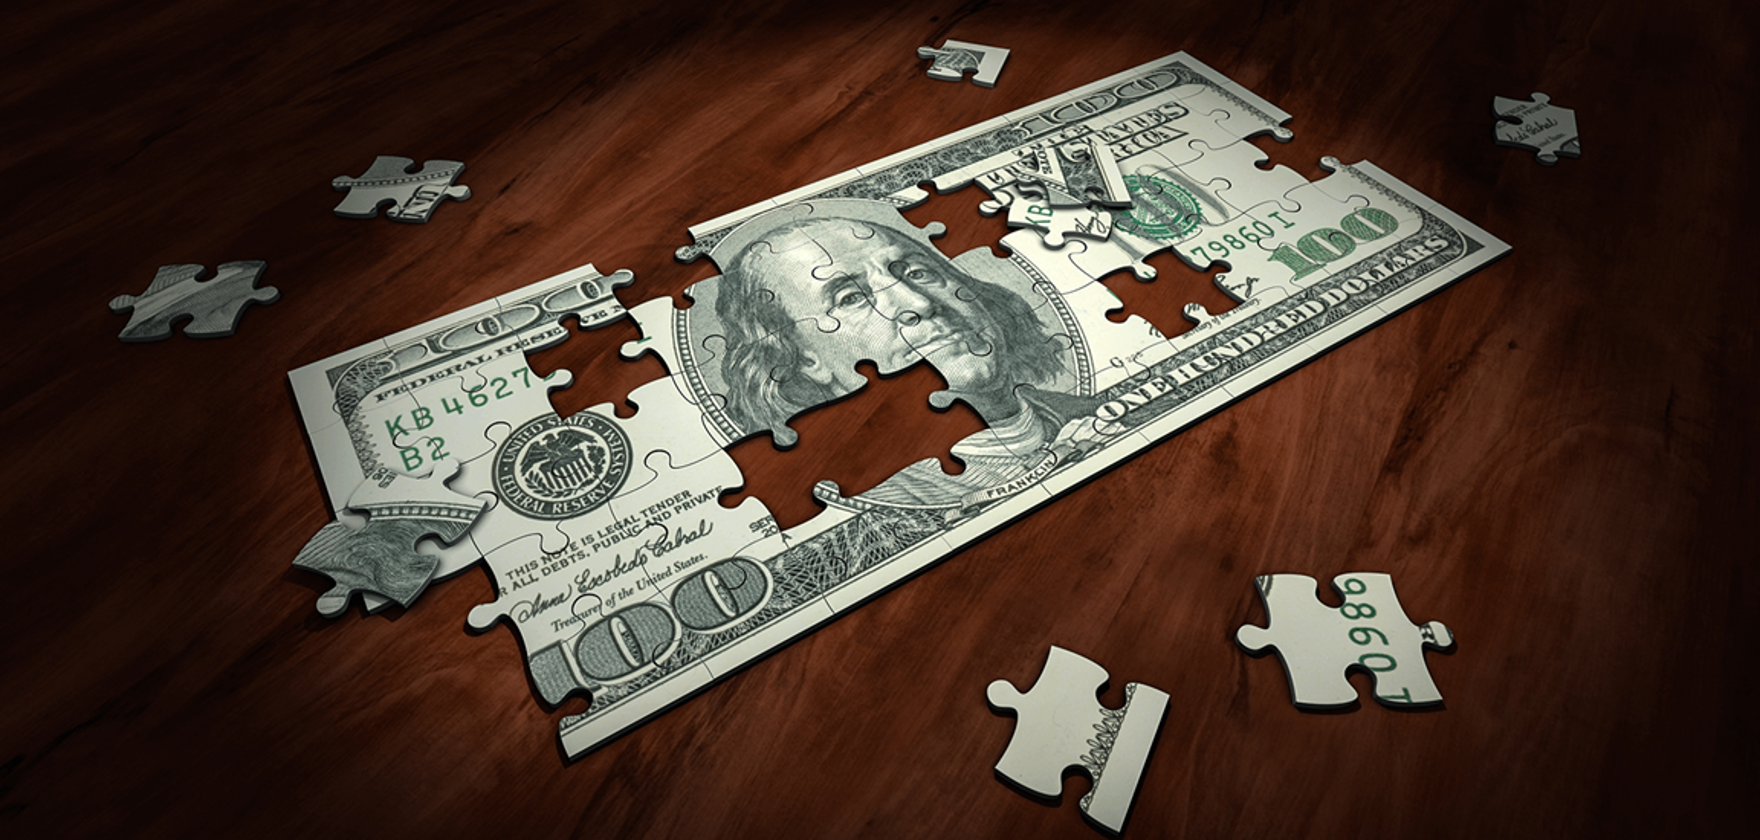 Puzzle of a hundred dollar bill. Courtesy of Arek Socha from Pixabay.